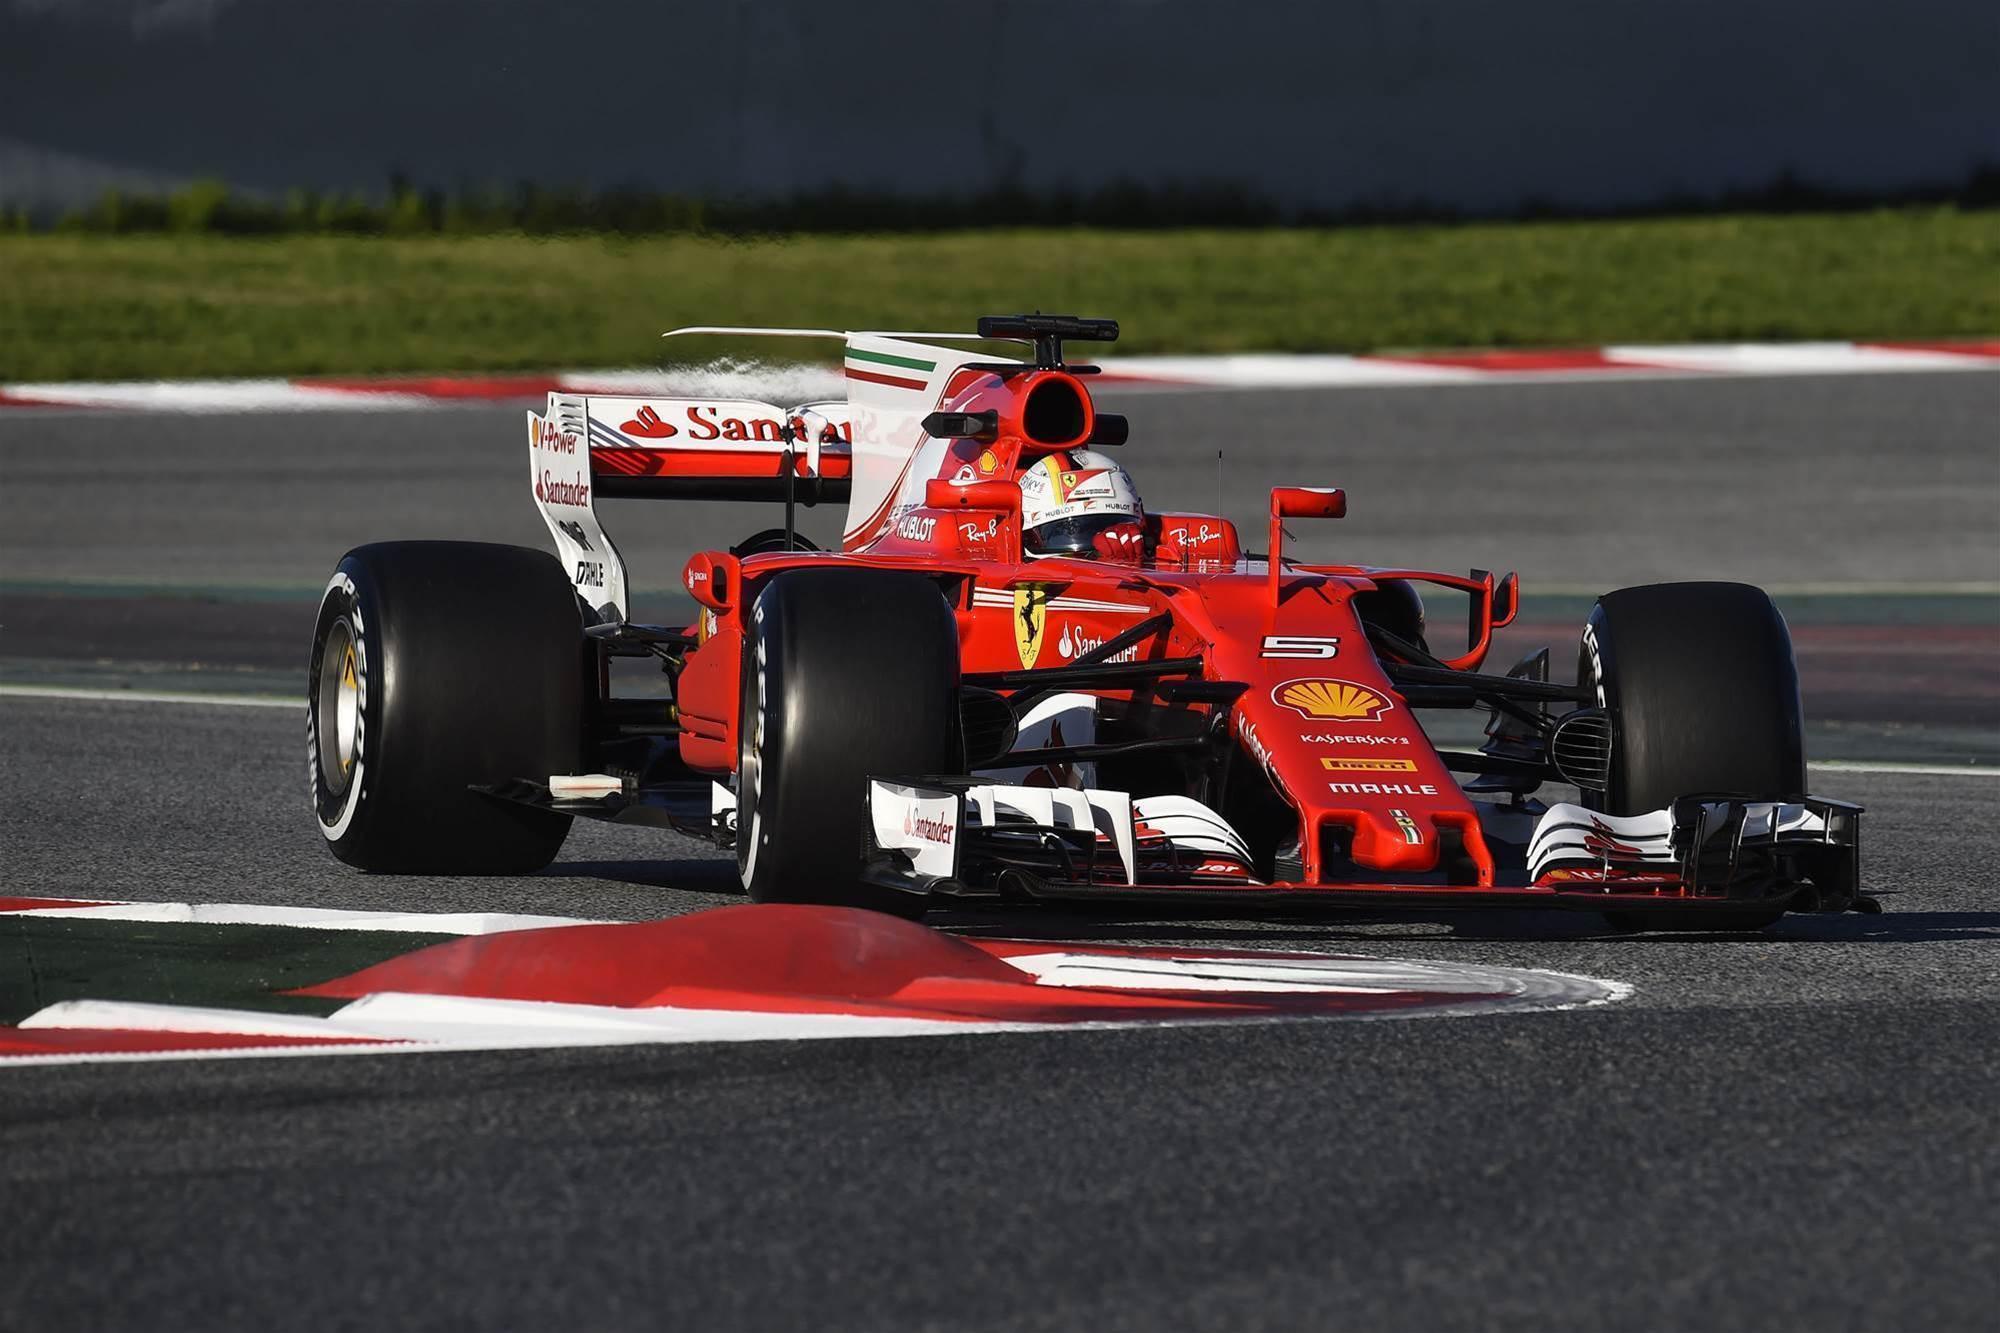 Ferrari sets the pace in F1 testing